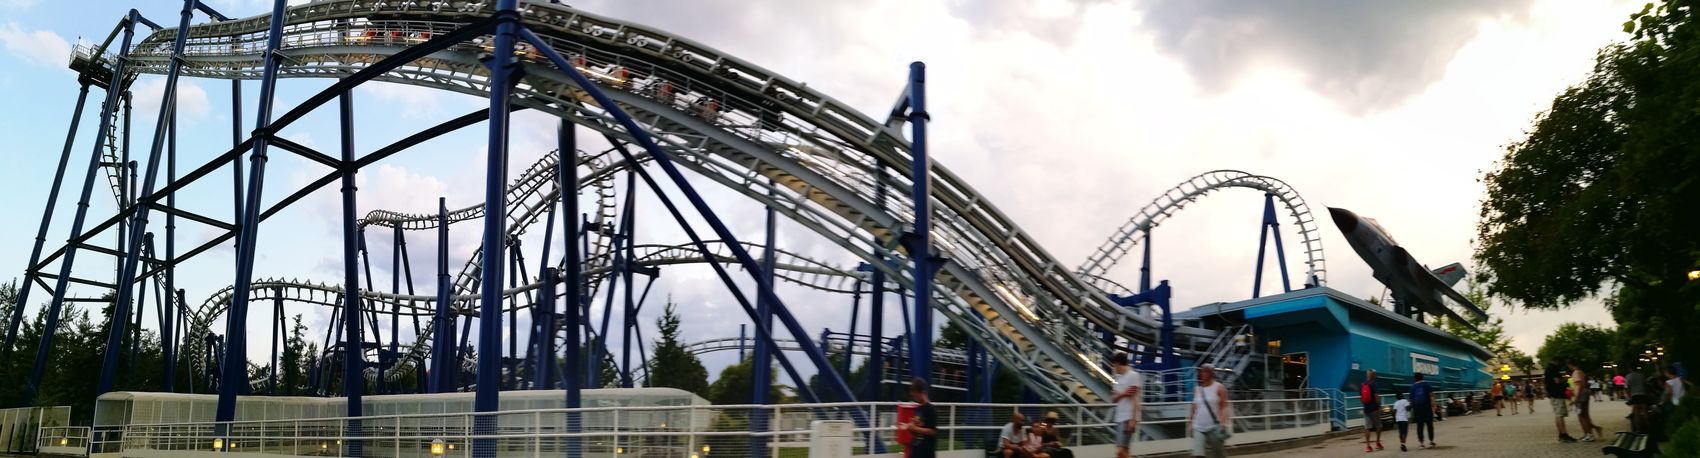 Rollercoaster Gardalandpark Happy Birthday!